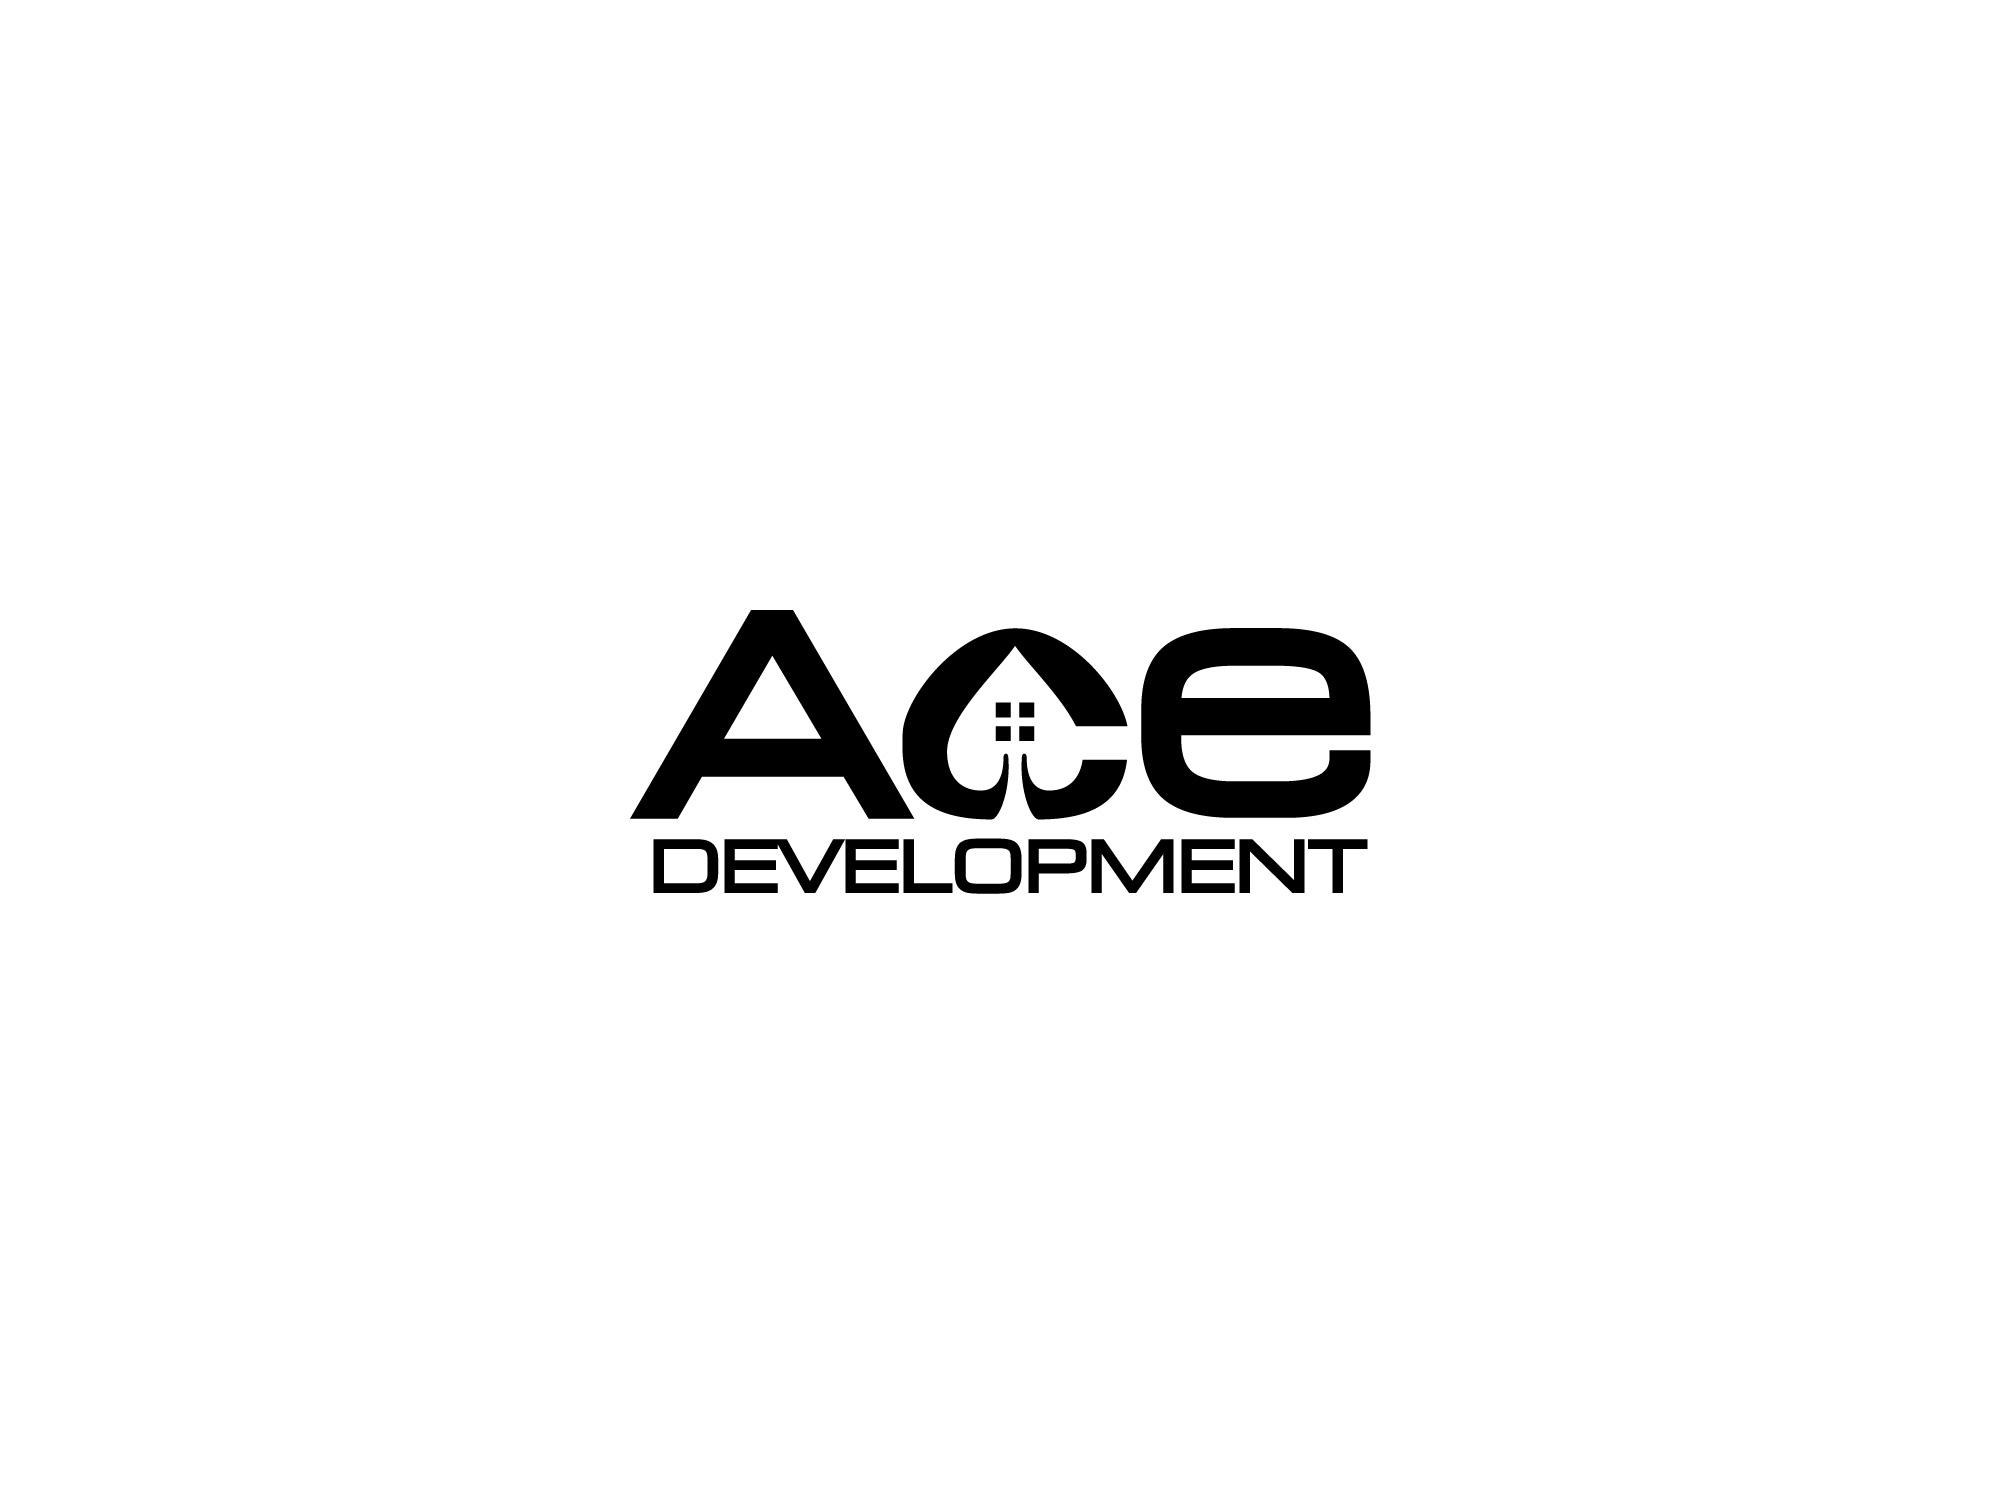 Logo Design by MD SHOHIDUL ISLAM - Entry No. 79 in the Logo Design Contest Fun Logo Design for Ace development.